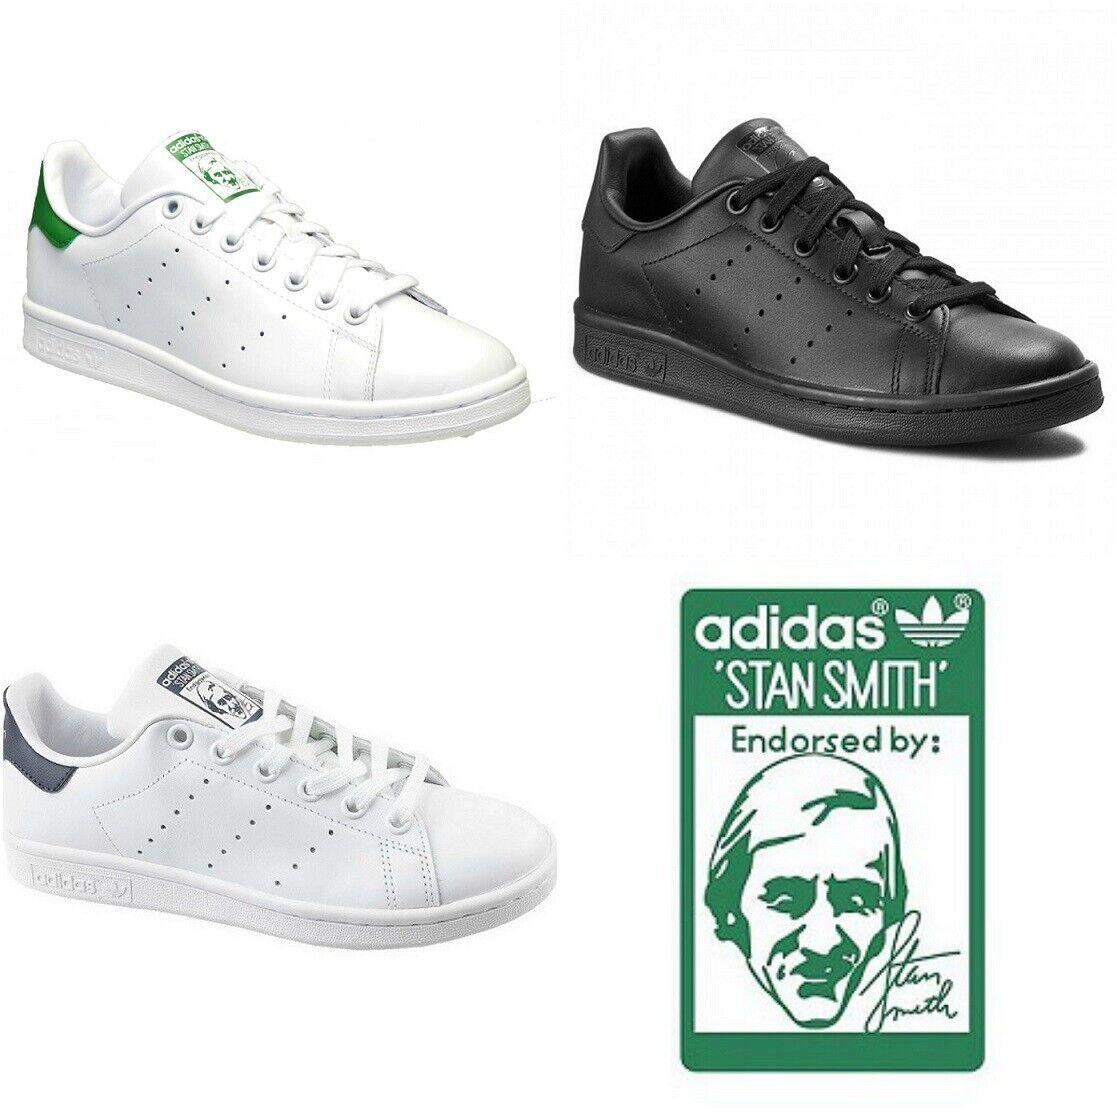 adidas Originals Damen Stan Smith Casual Fashion Lace Up